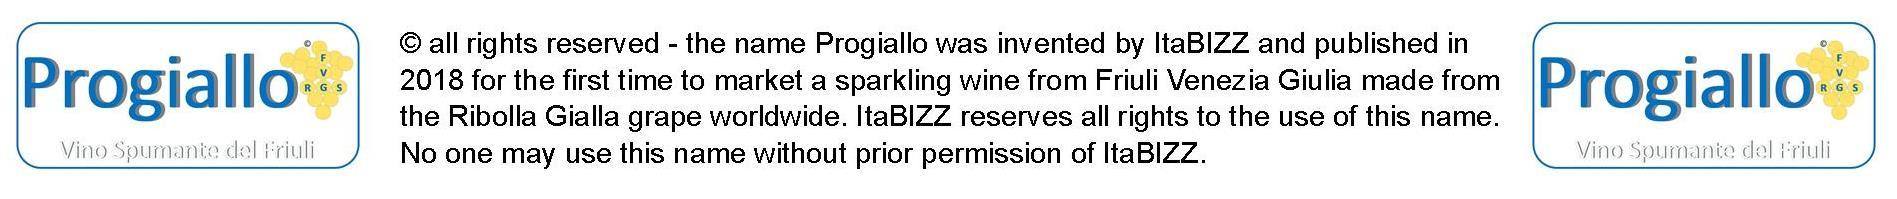 all-rights-reserved_progiallo_itabiz